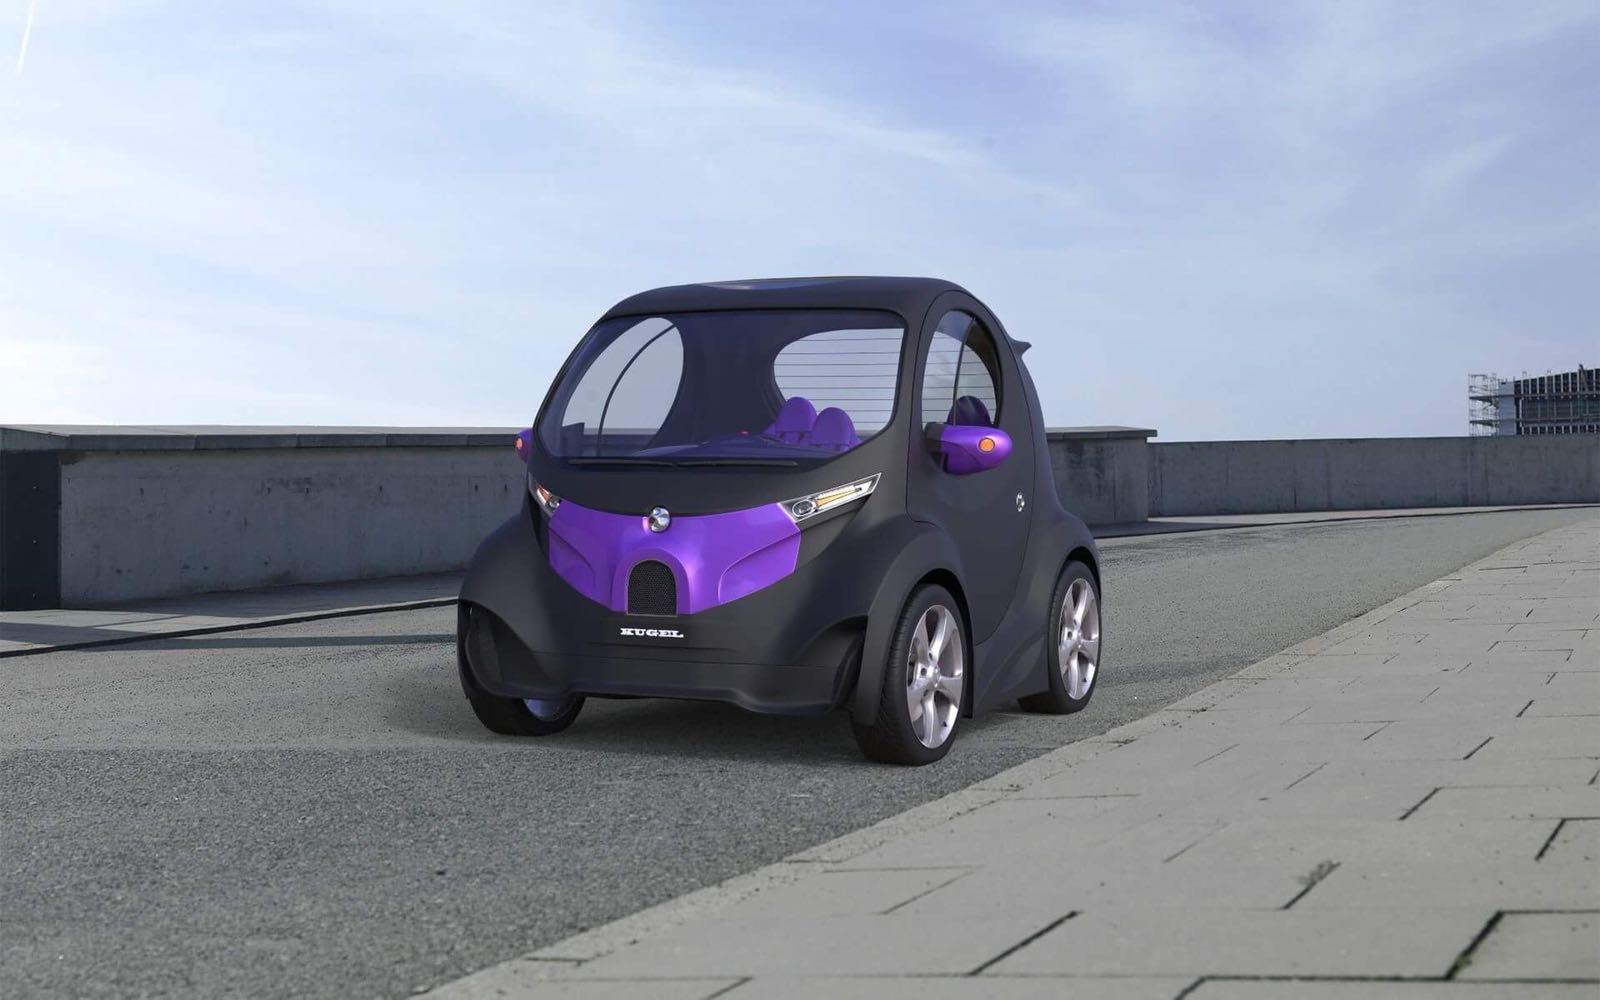 Украинец, создавший суперкар Himera, показал новый электромобиль 1